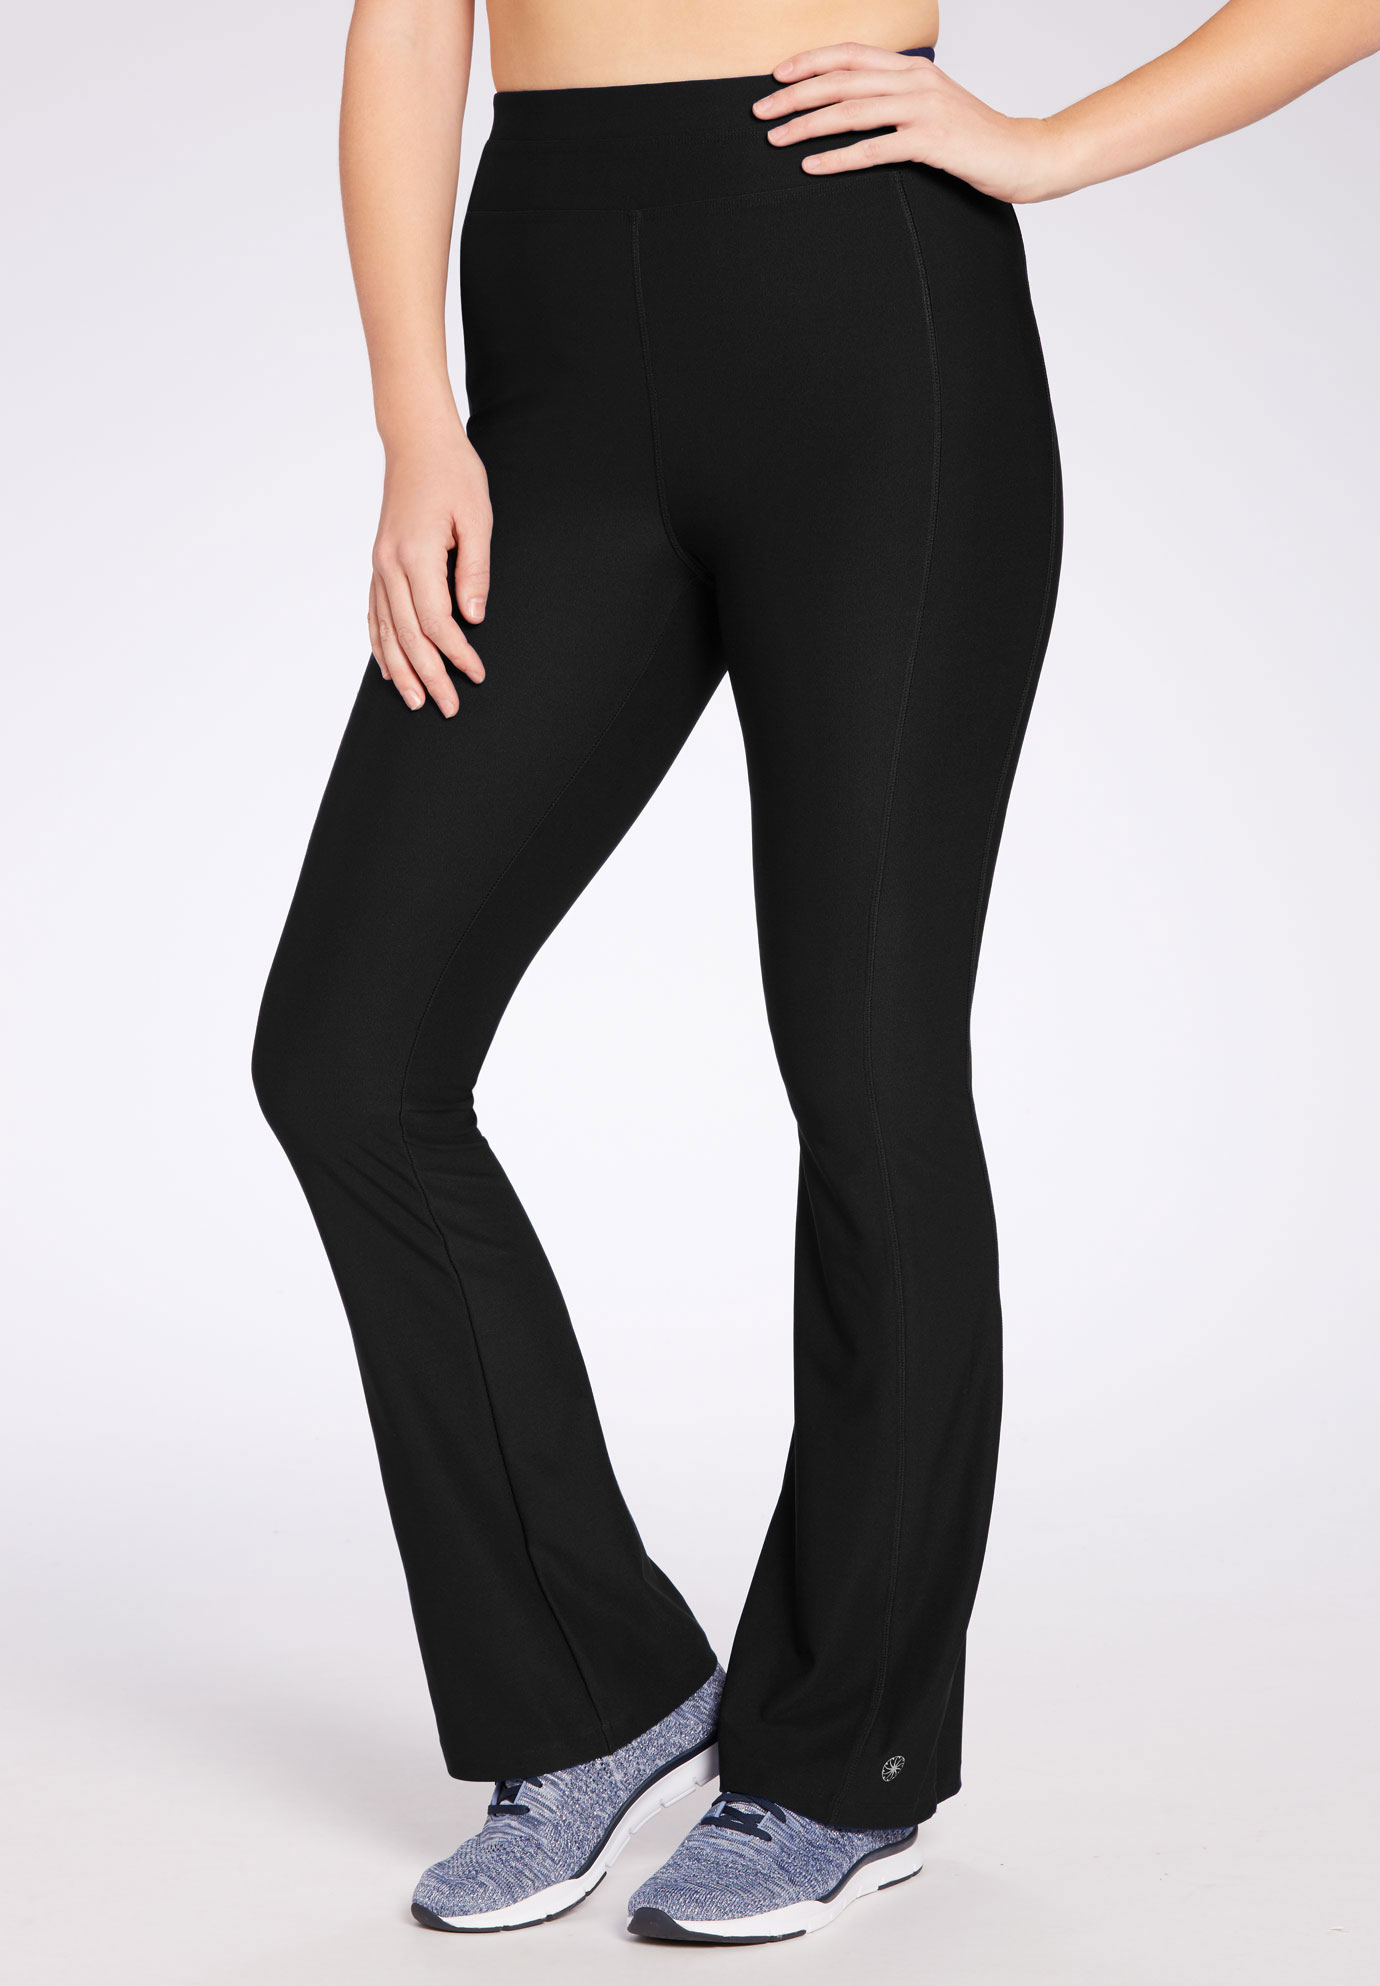 Bootcut Yoga Pant By Fullbeauty Sport 174 Plus Size Pants